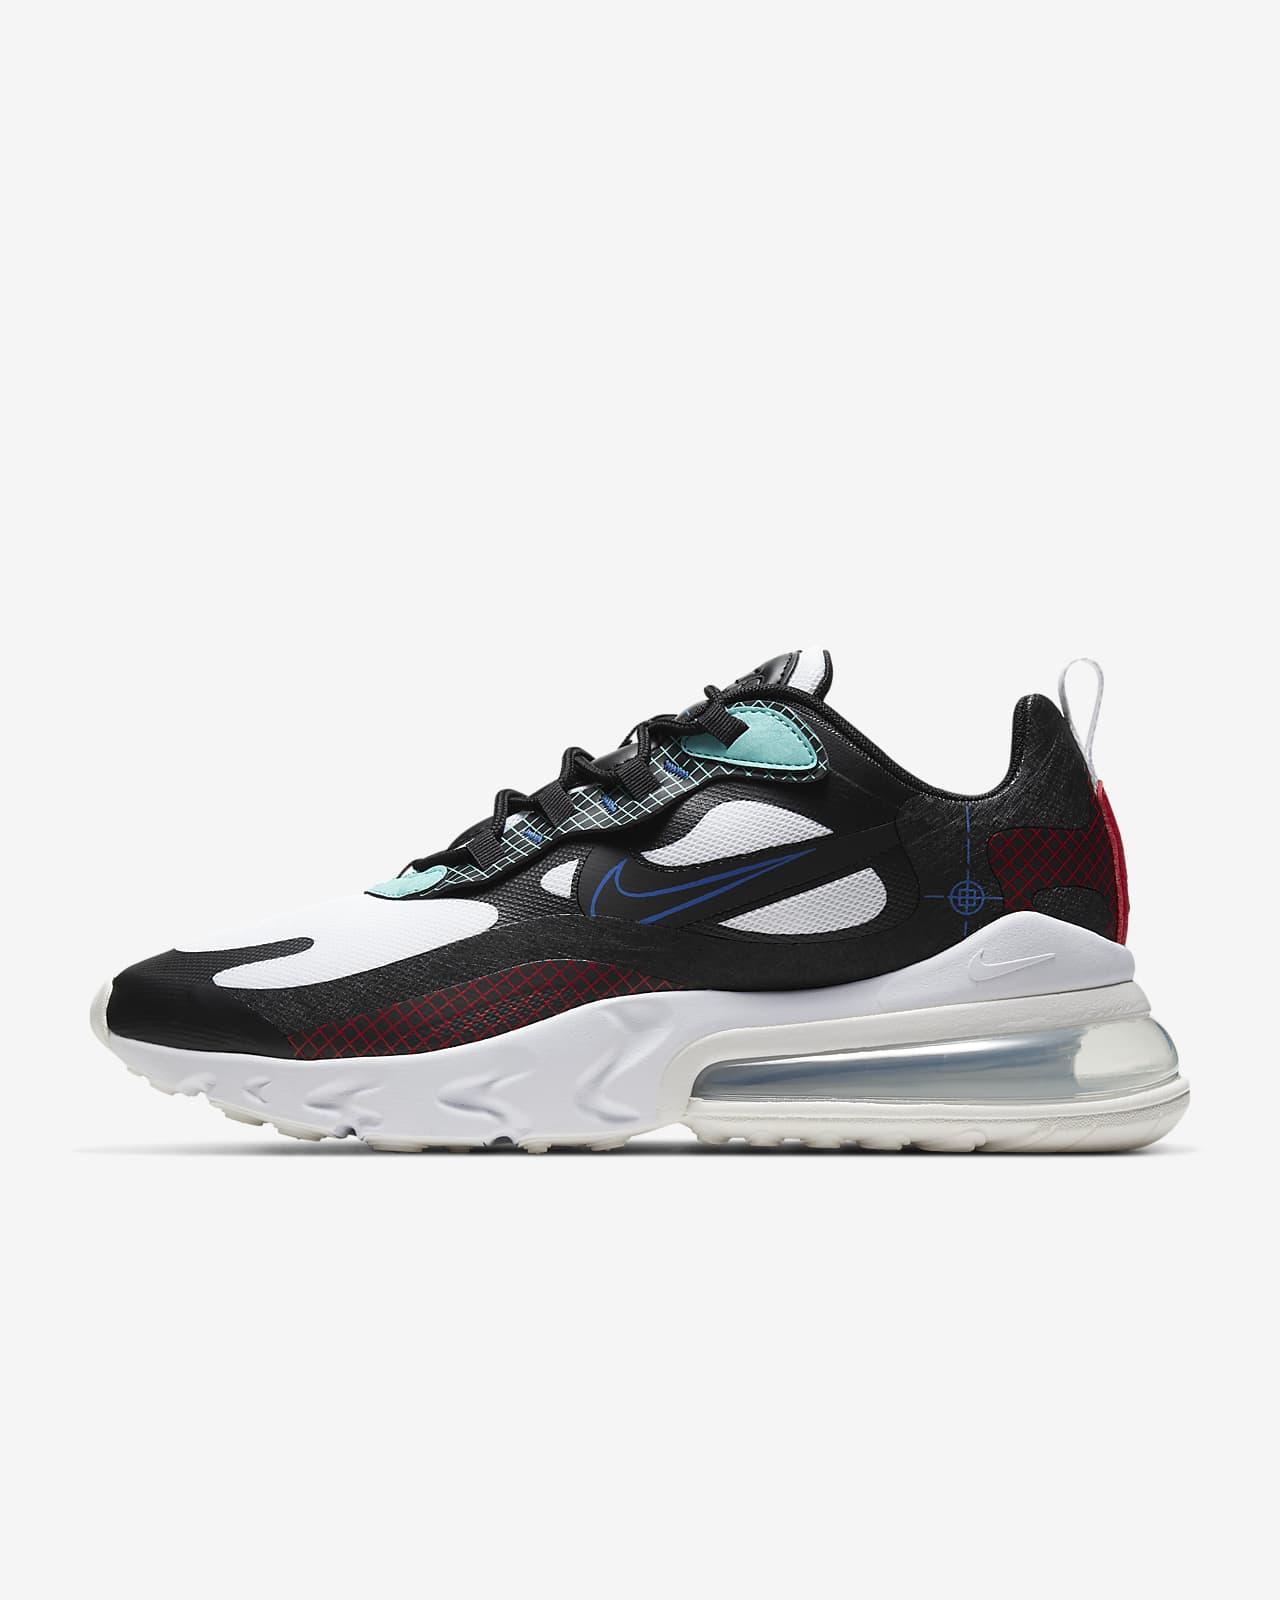 Nike Air Max 270 React Herenschoen